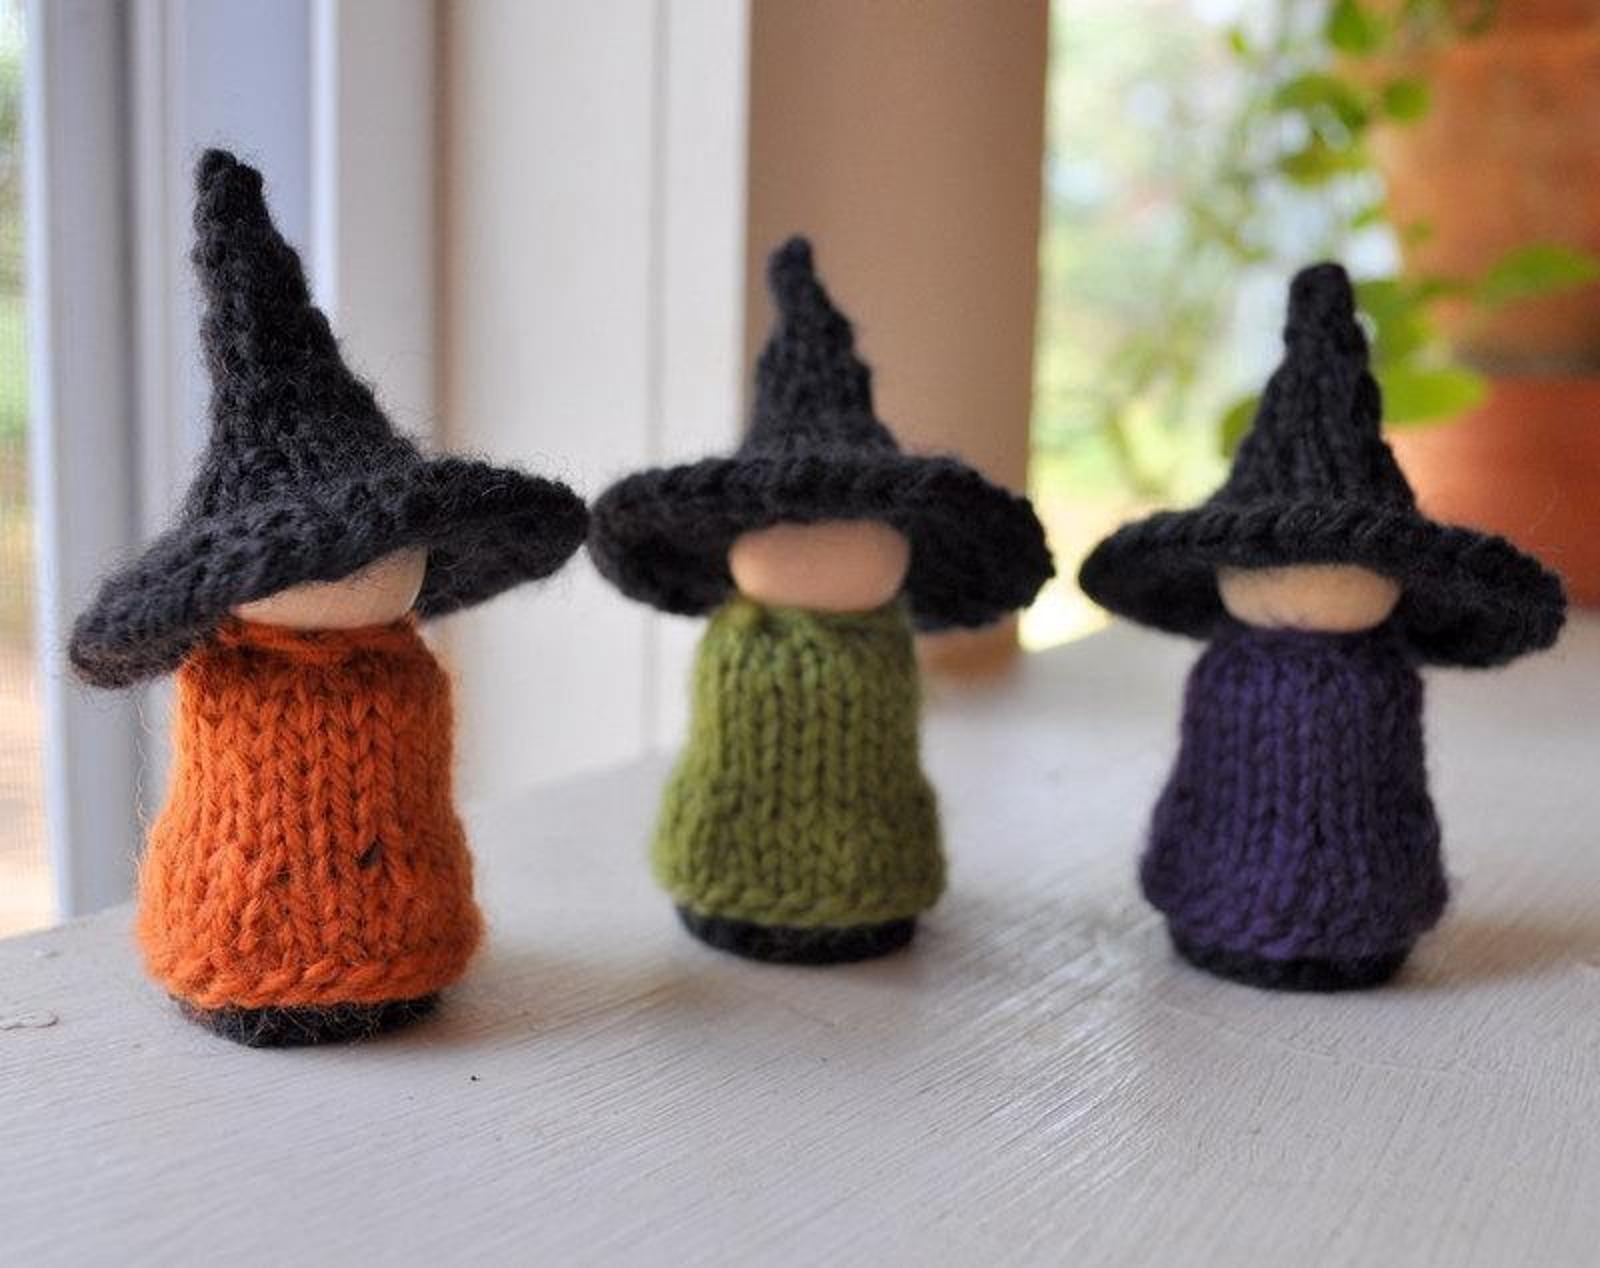 Creepy & Cute Halloween Knitting Patterns  Halloween knitting